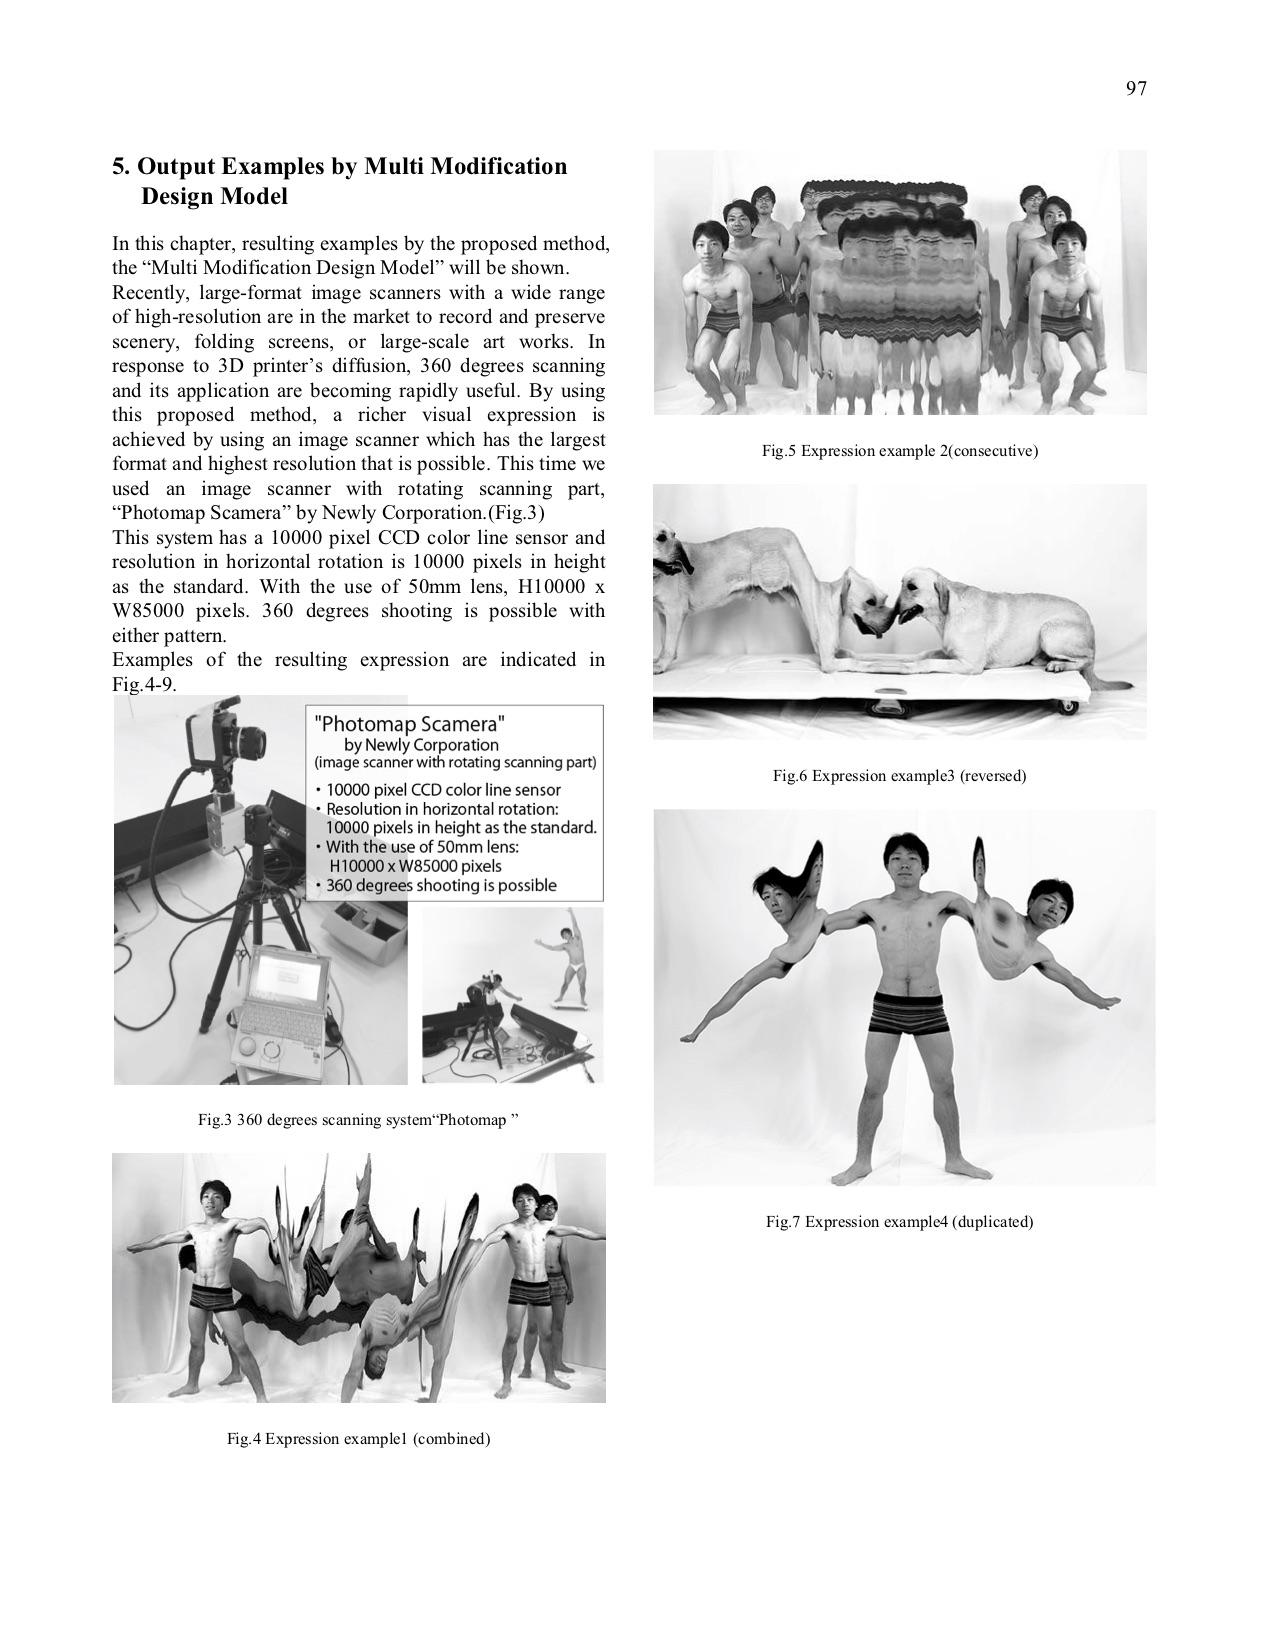 Academic Paper p4